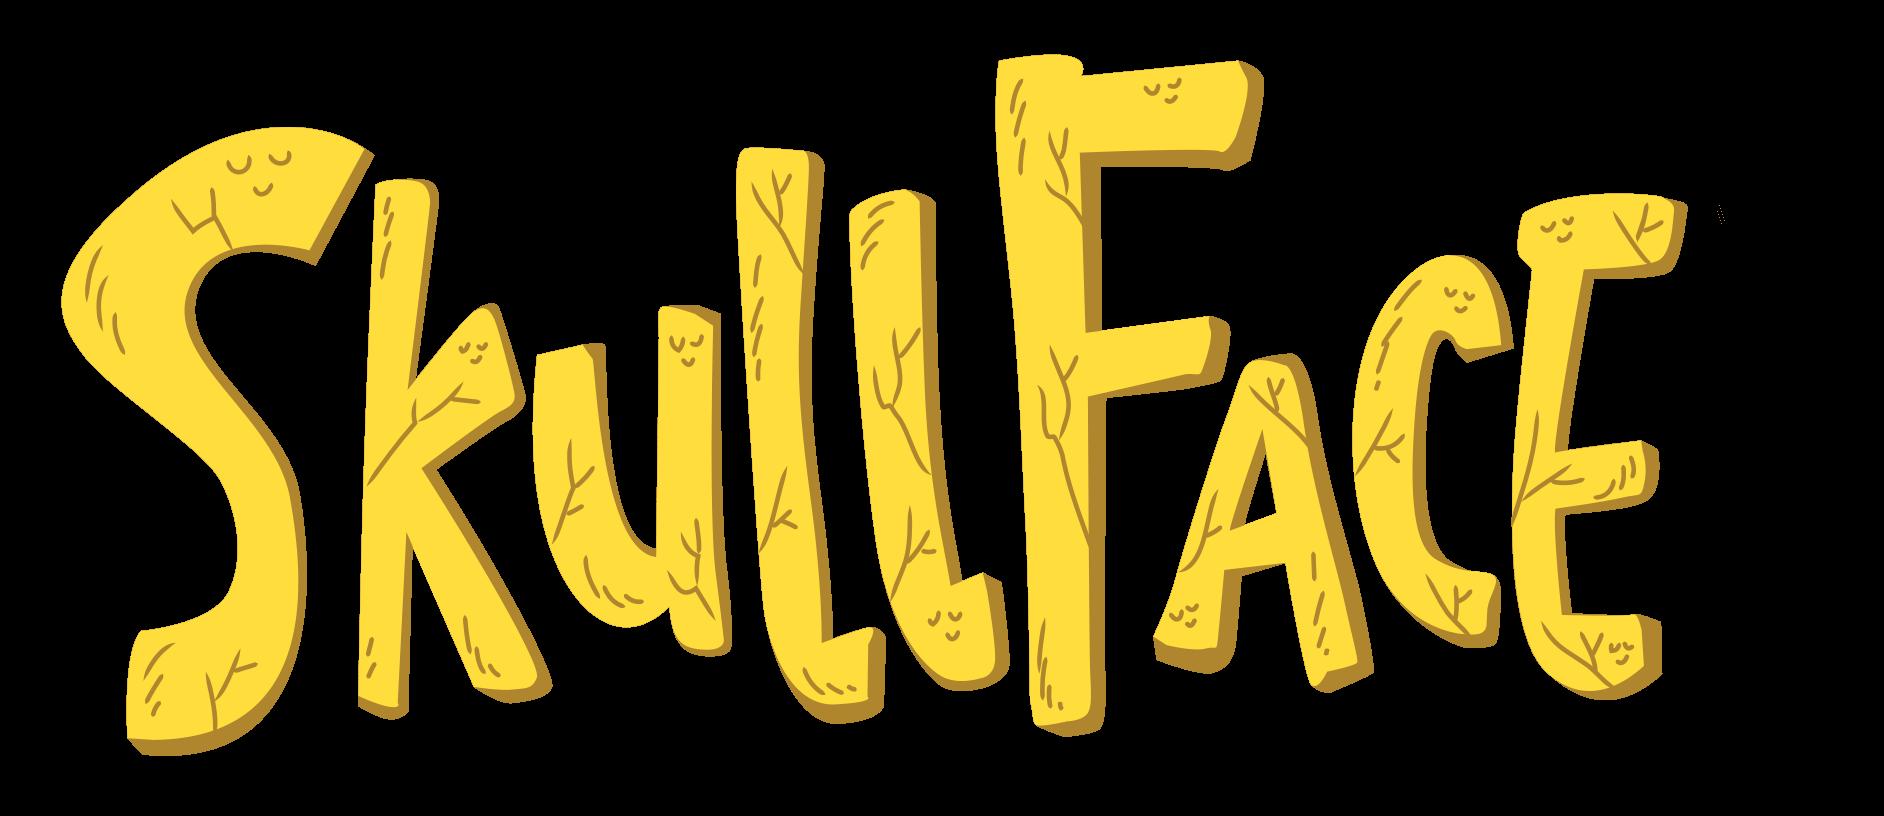 title_skullface